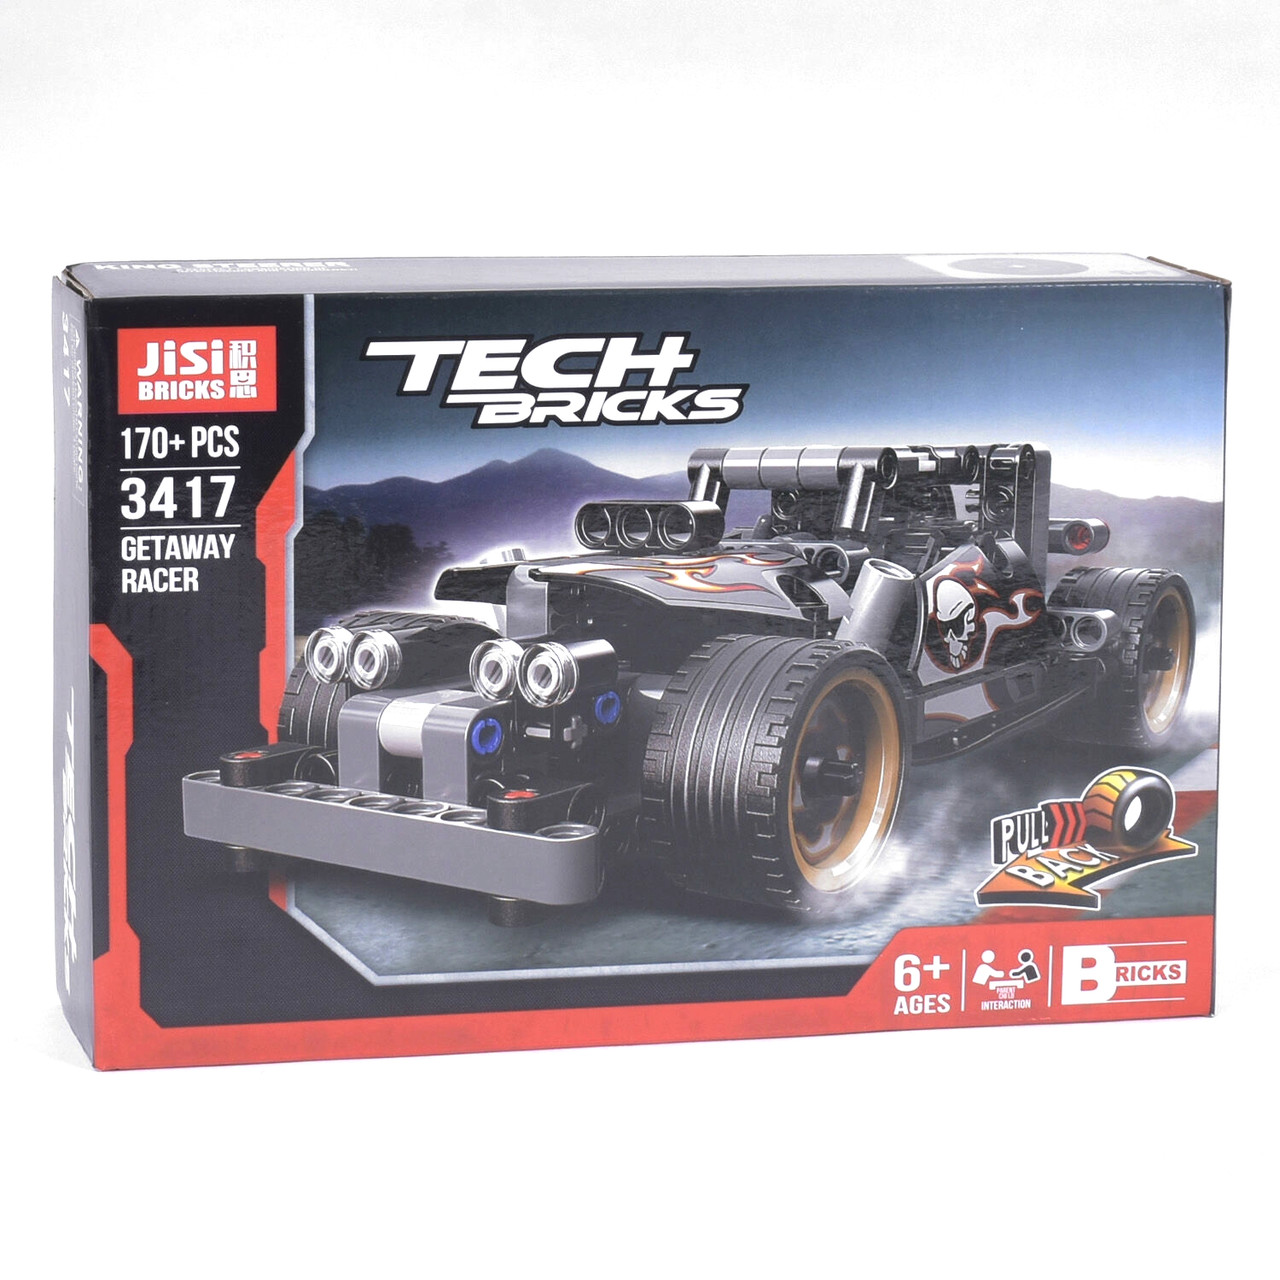 Конструктор Decool Jisi Bricks Tech Bricks 3417 170 деталей